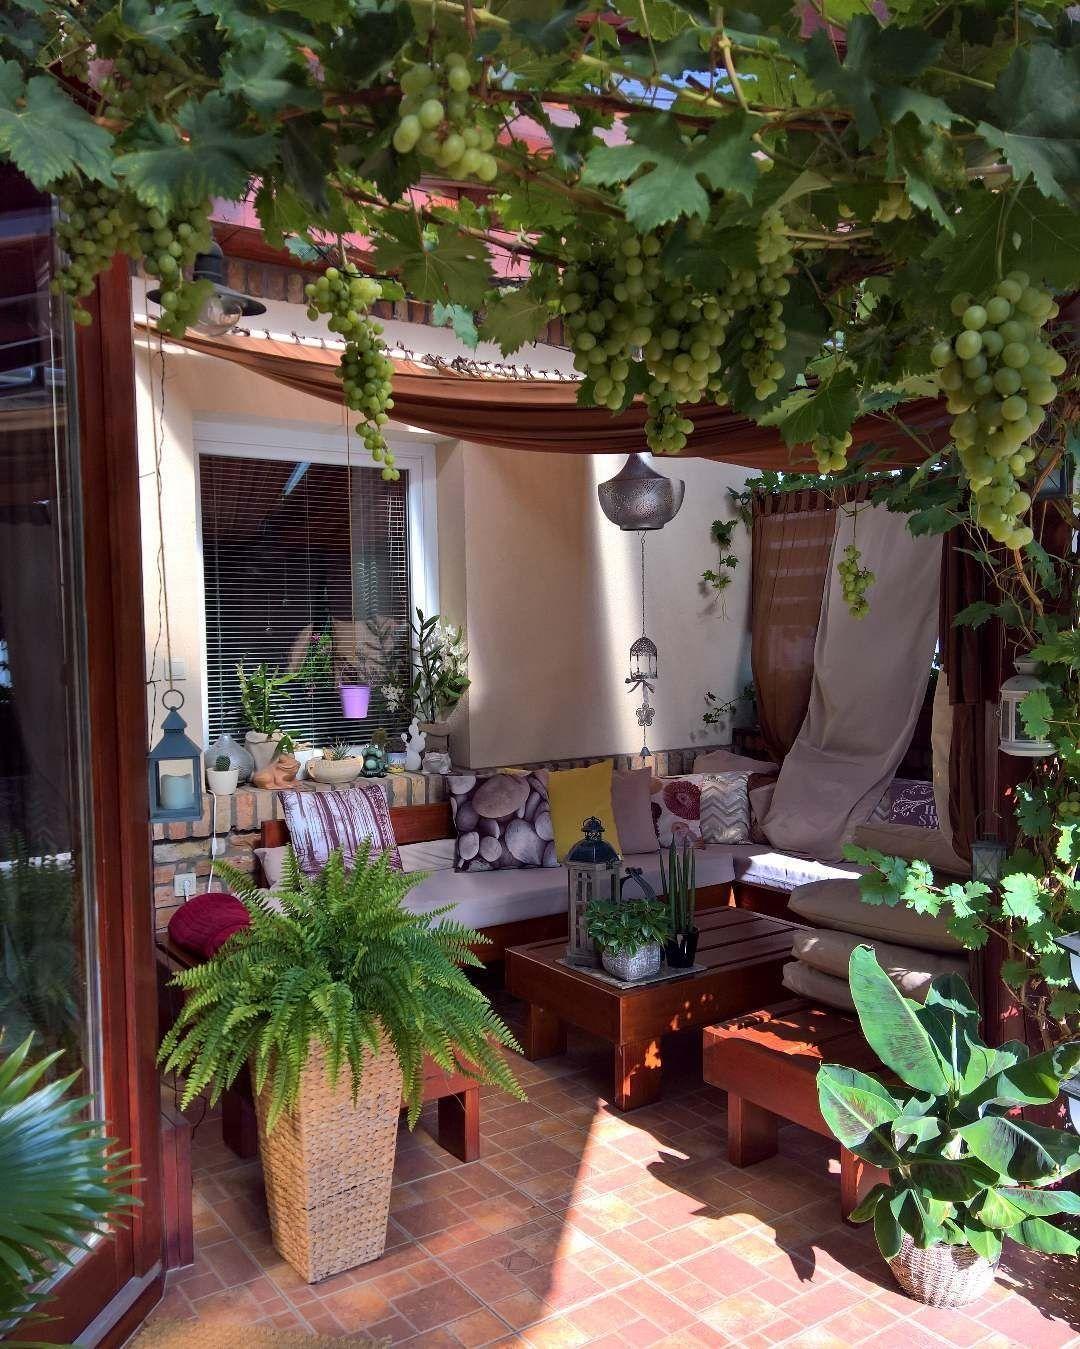 Calvin Lucas On Instagram Source Mylovelysmallgarden My Gardenroom In Jul 2018 Outdoor Decor Backyard Yard Landscaping